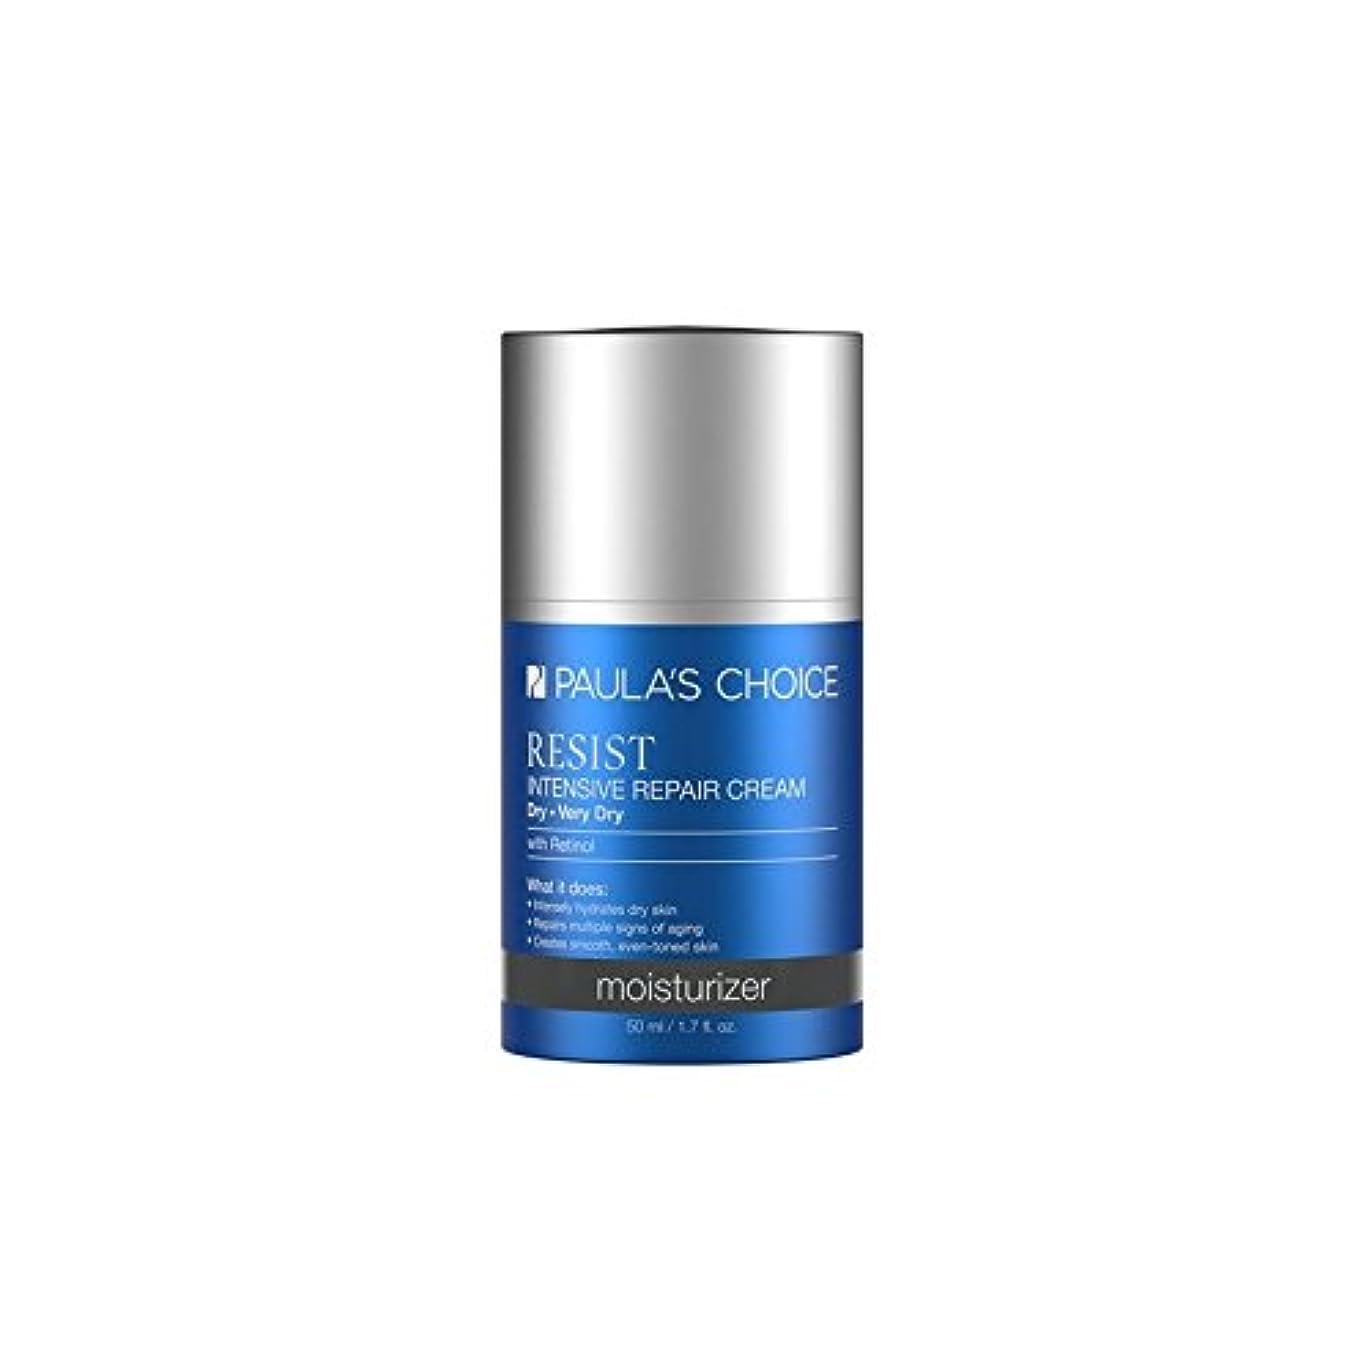 Paula's Choice Resist Intensive Repair Cream (50ml) (Pack of 6) - ポーラチョイスの集中リペアクリーム(50)に抵抗します x6 [並行輸入品]